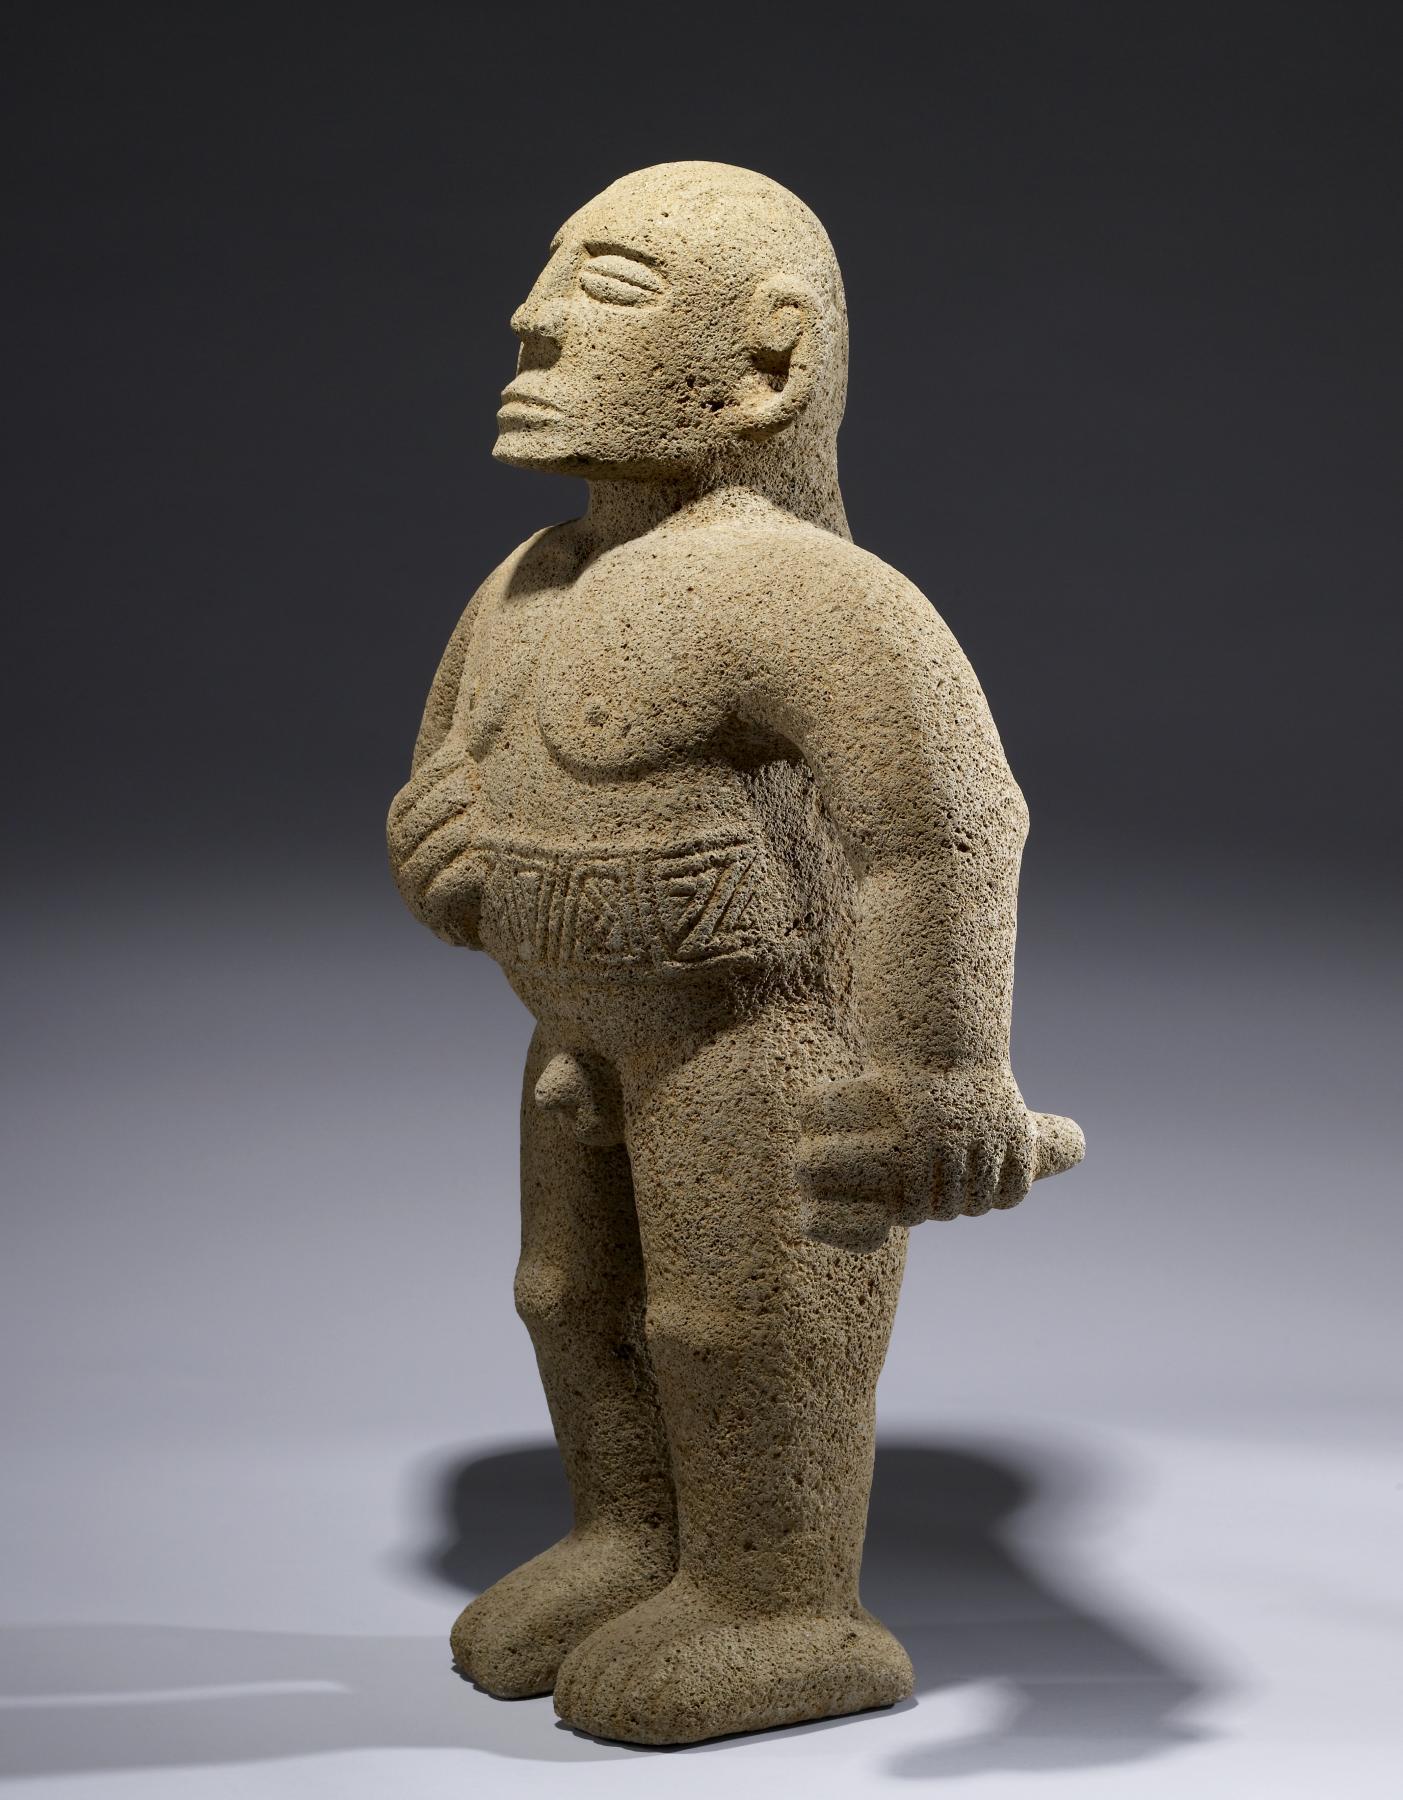 Archivo:Costa Rican - Warrior Figure - Walters 20092025 - Three Quarter  Left.jpg - Wikipedia, la enciclopedia libre